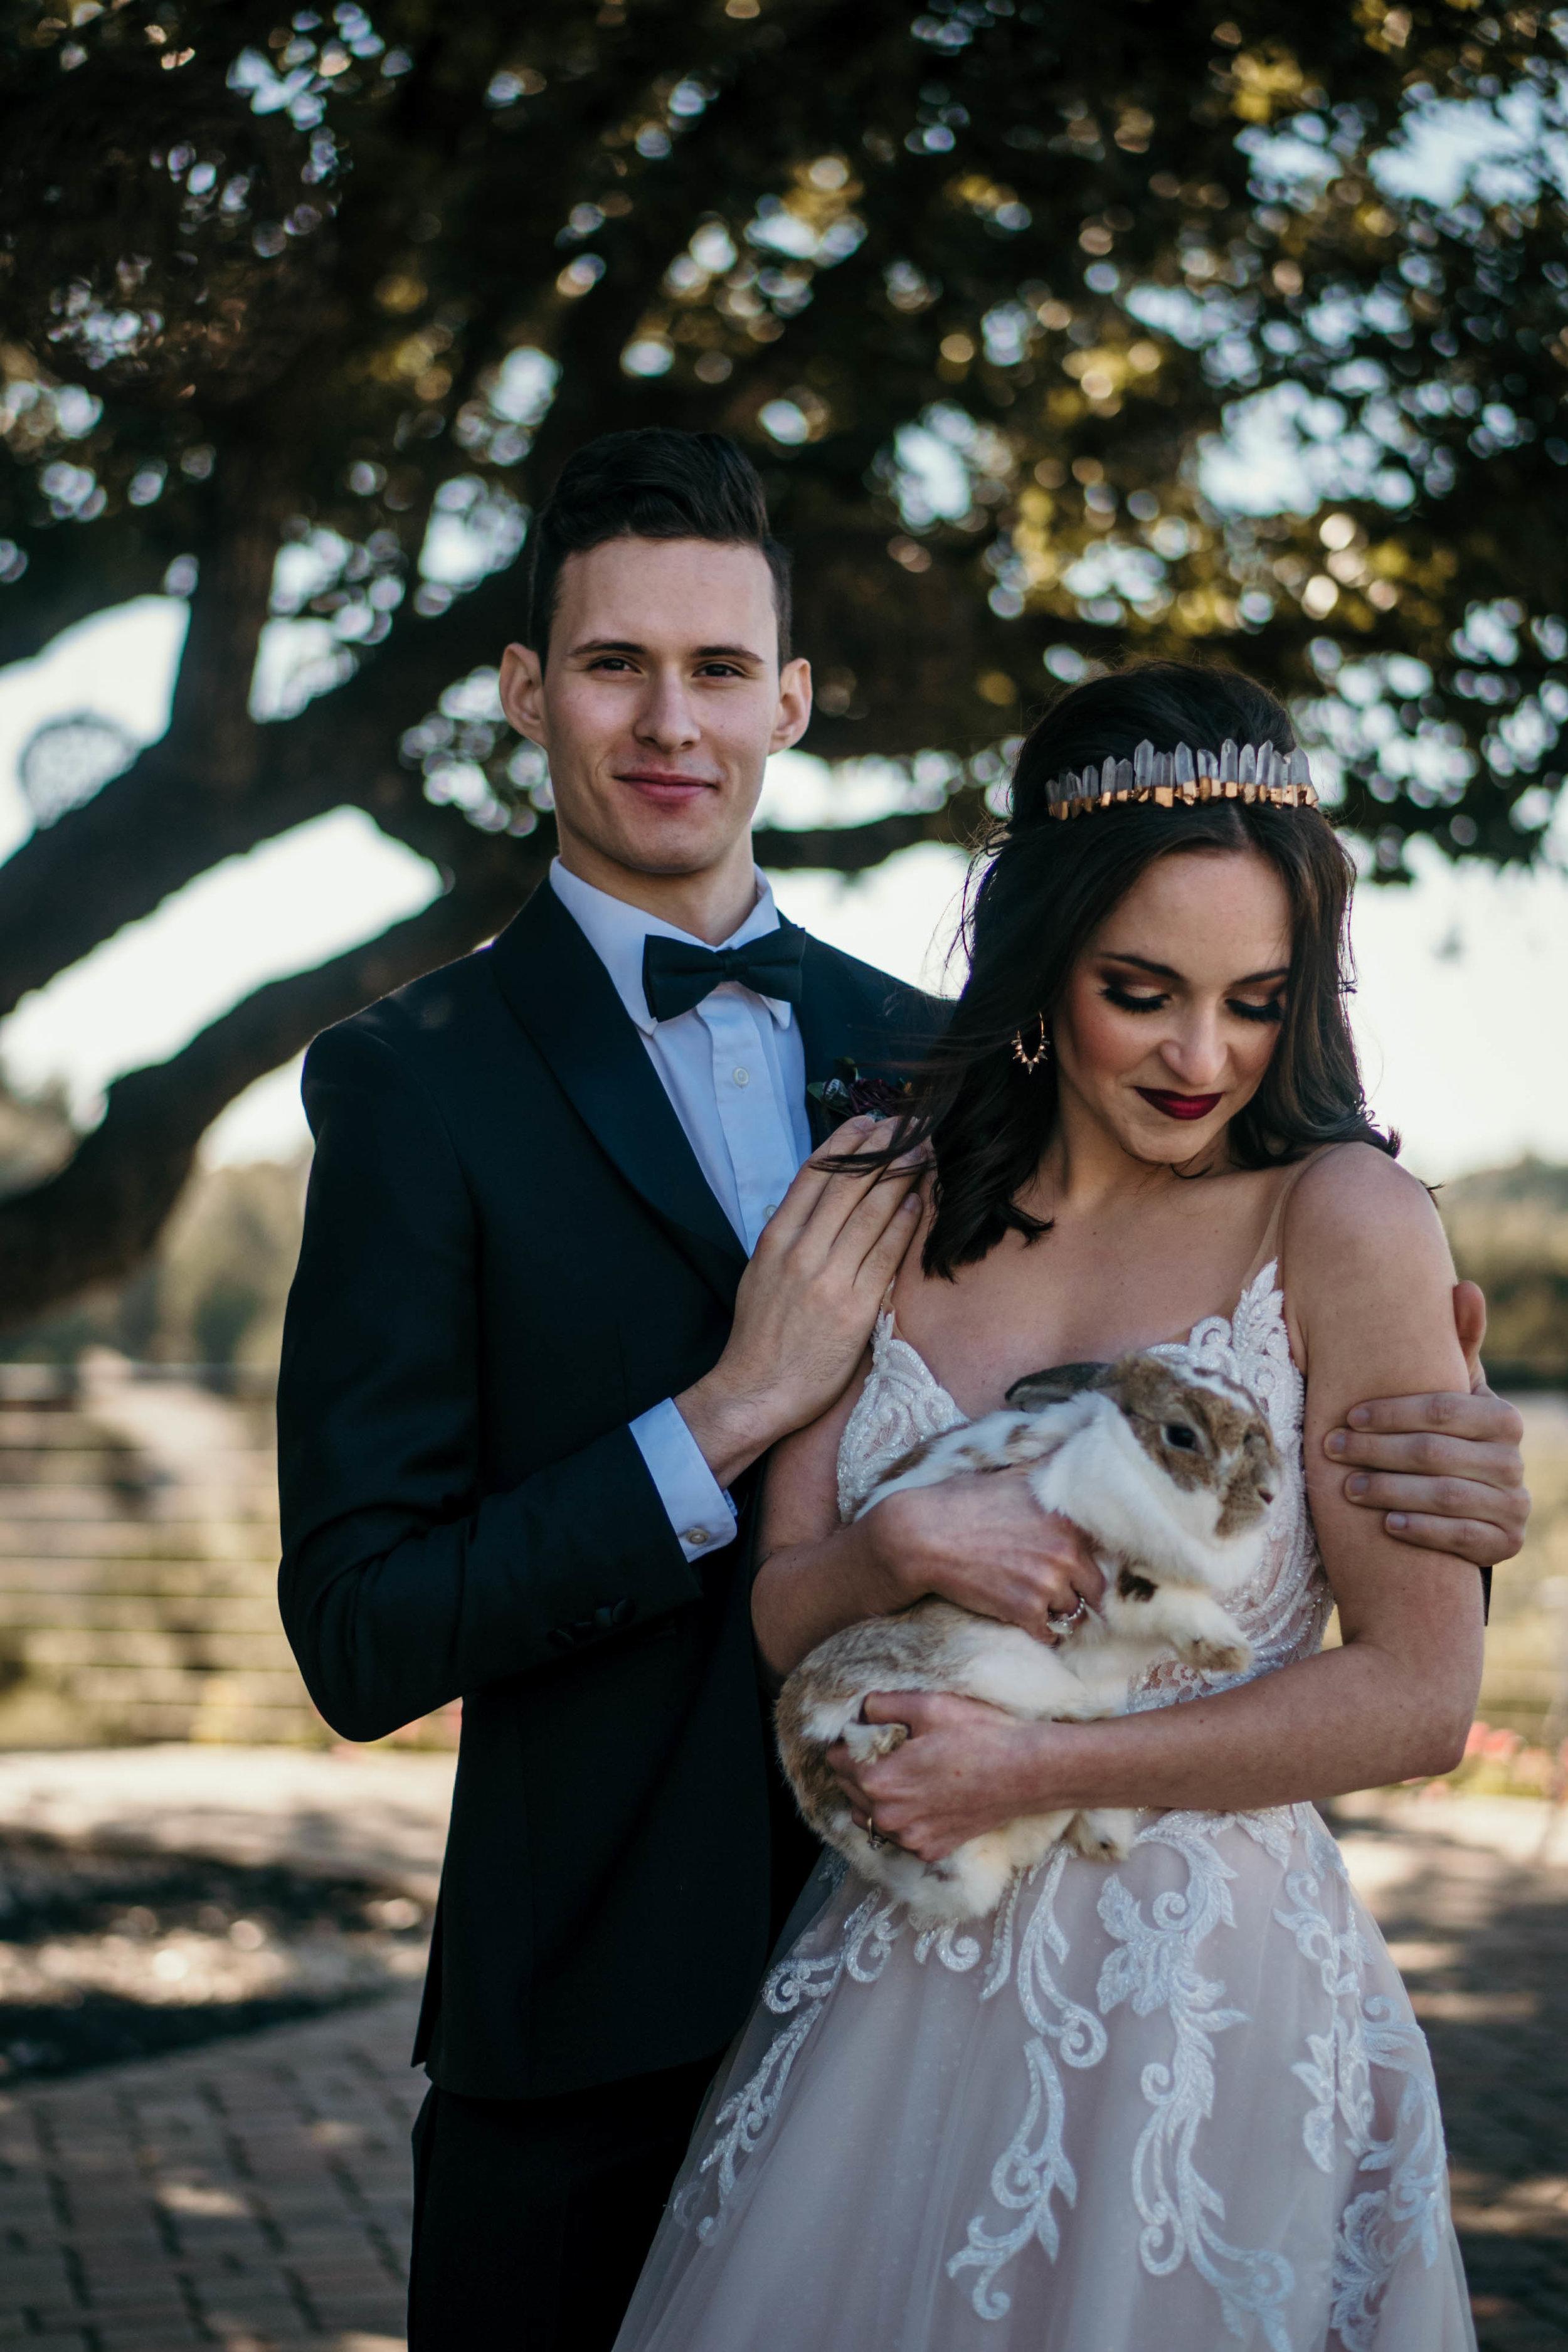 Austin Wedding Videographer - Dolls for Dolls (157 of 323).jpg